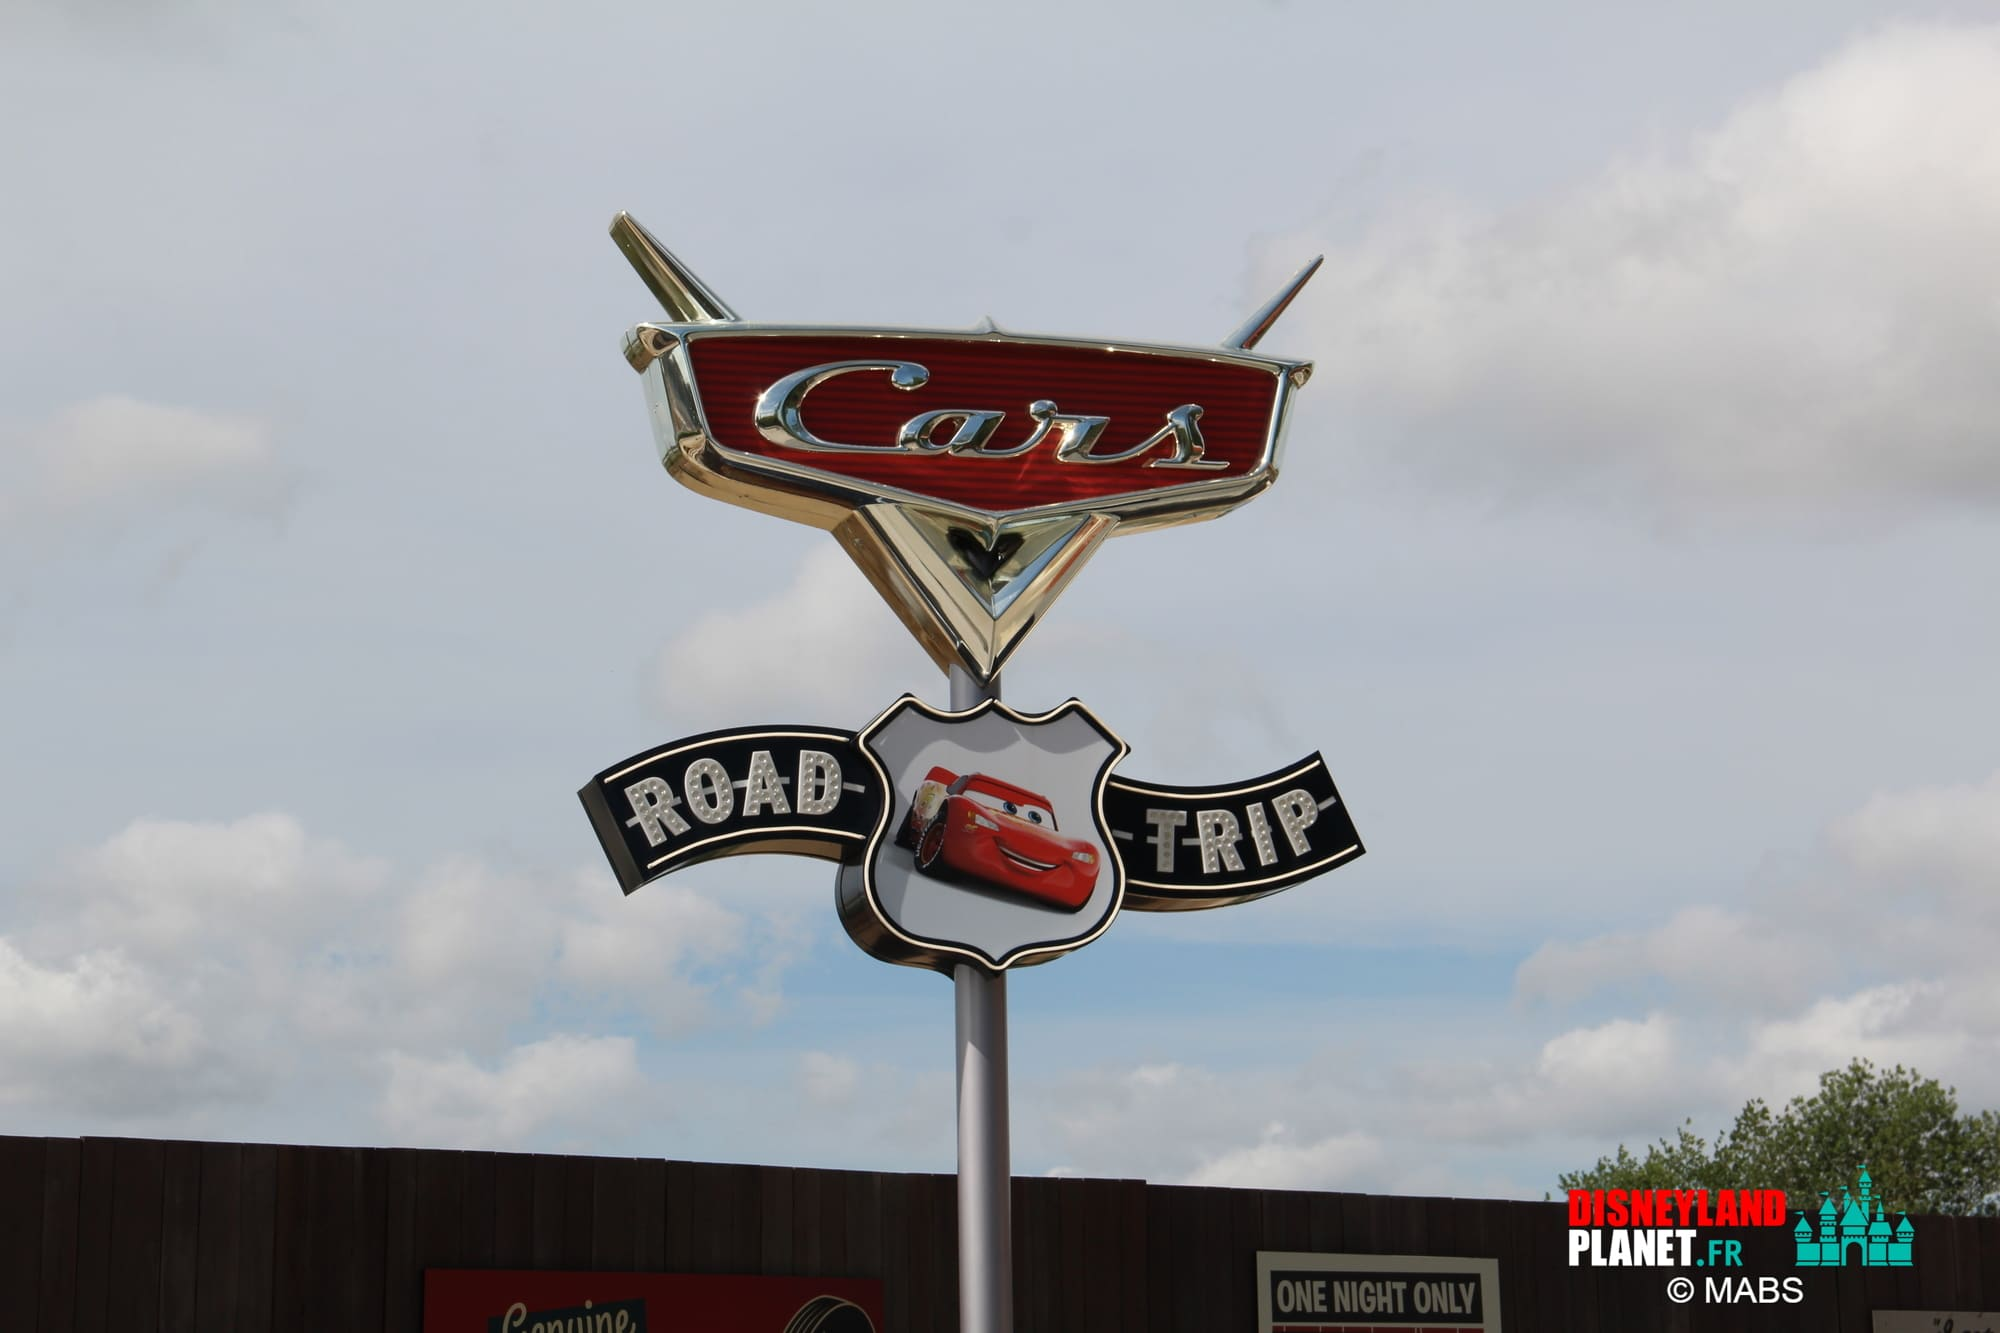 cars route 66 road trip disneyland paris